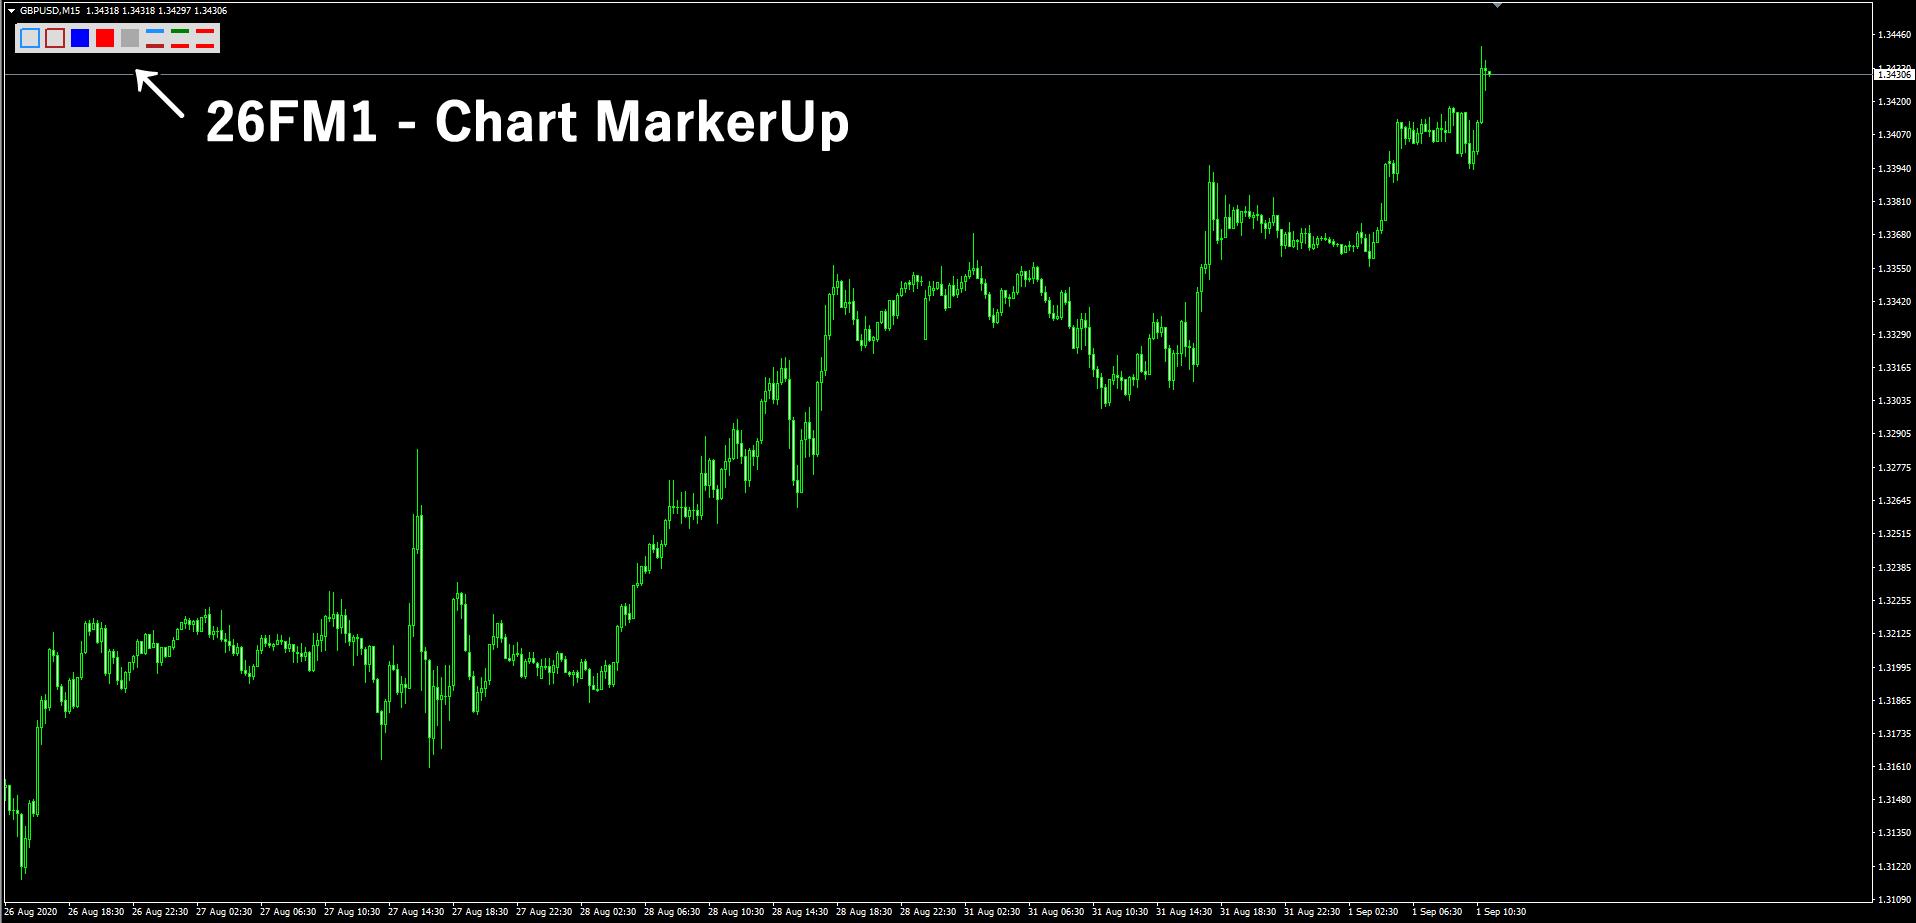 26FM1 - Chart MarkerUpを表示したチャート画像